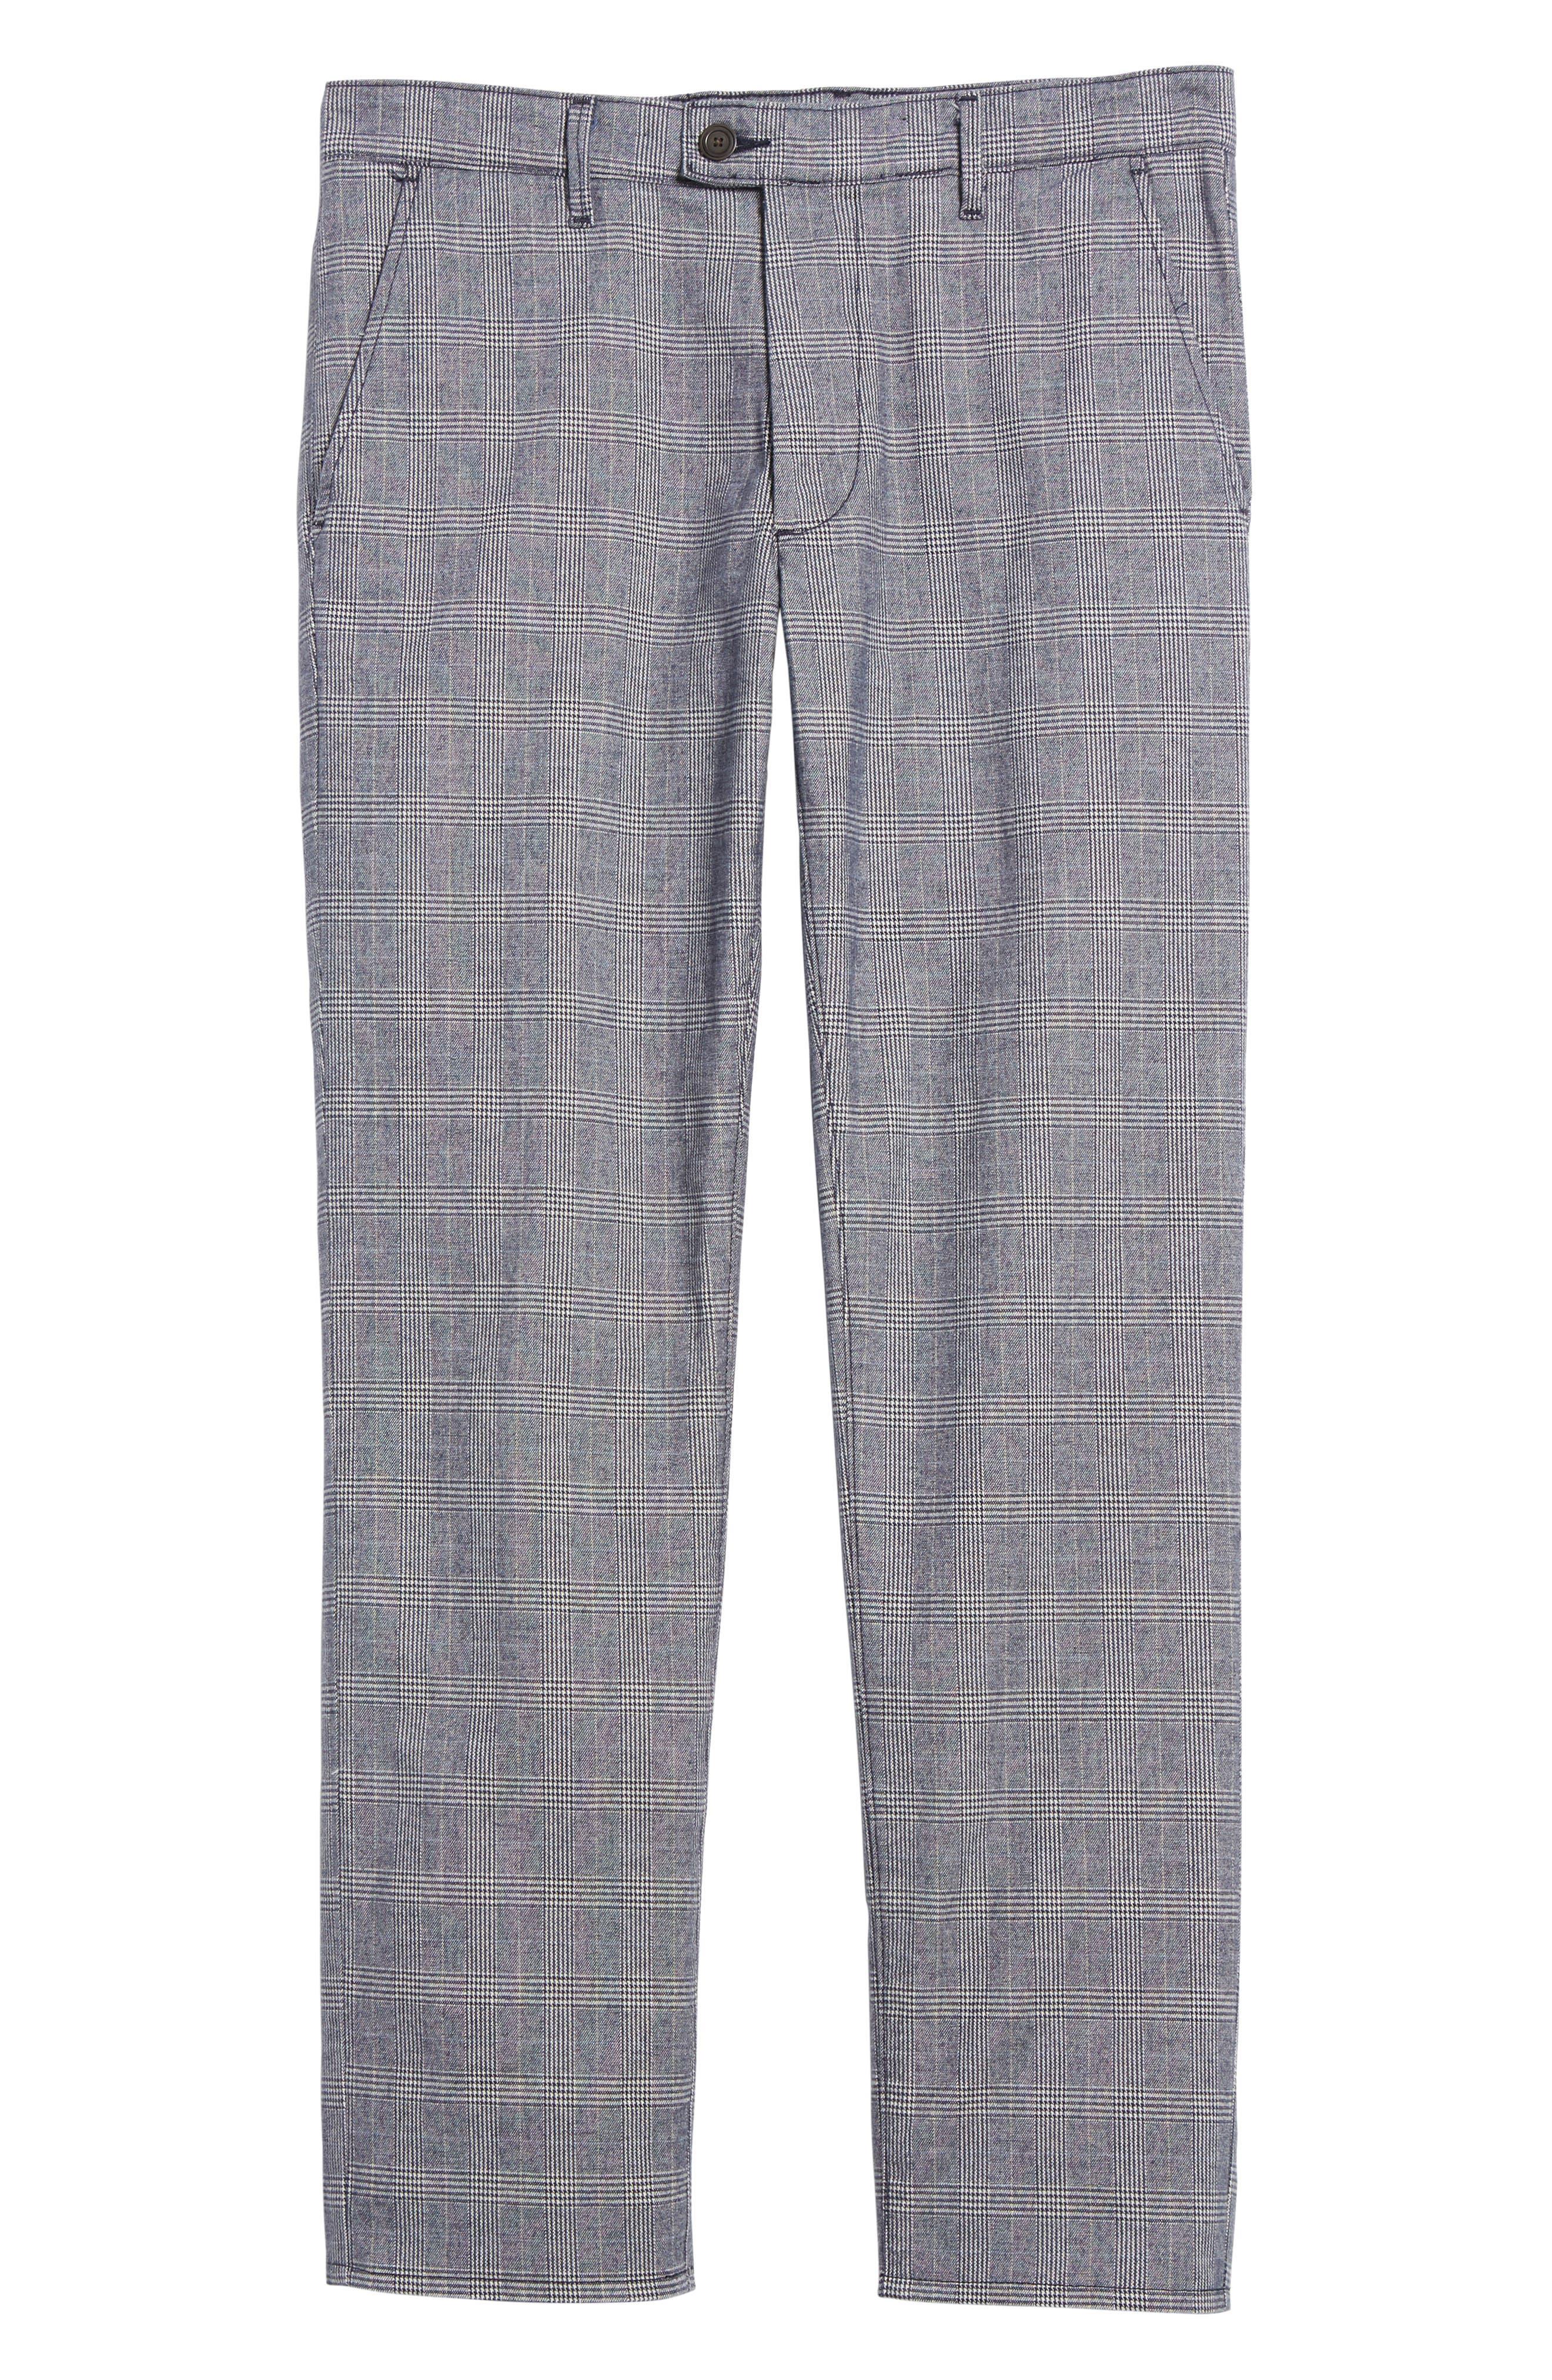 Marshall Slim Fit Pants,                             Alternate thumbnail 18, color,